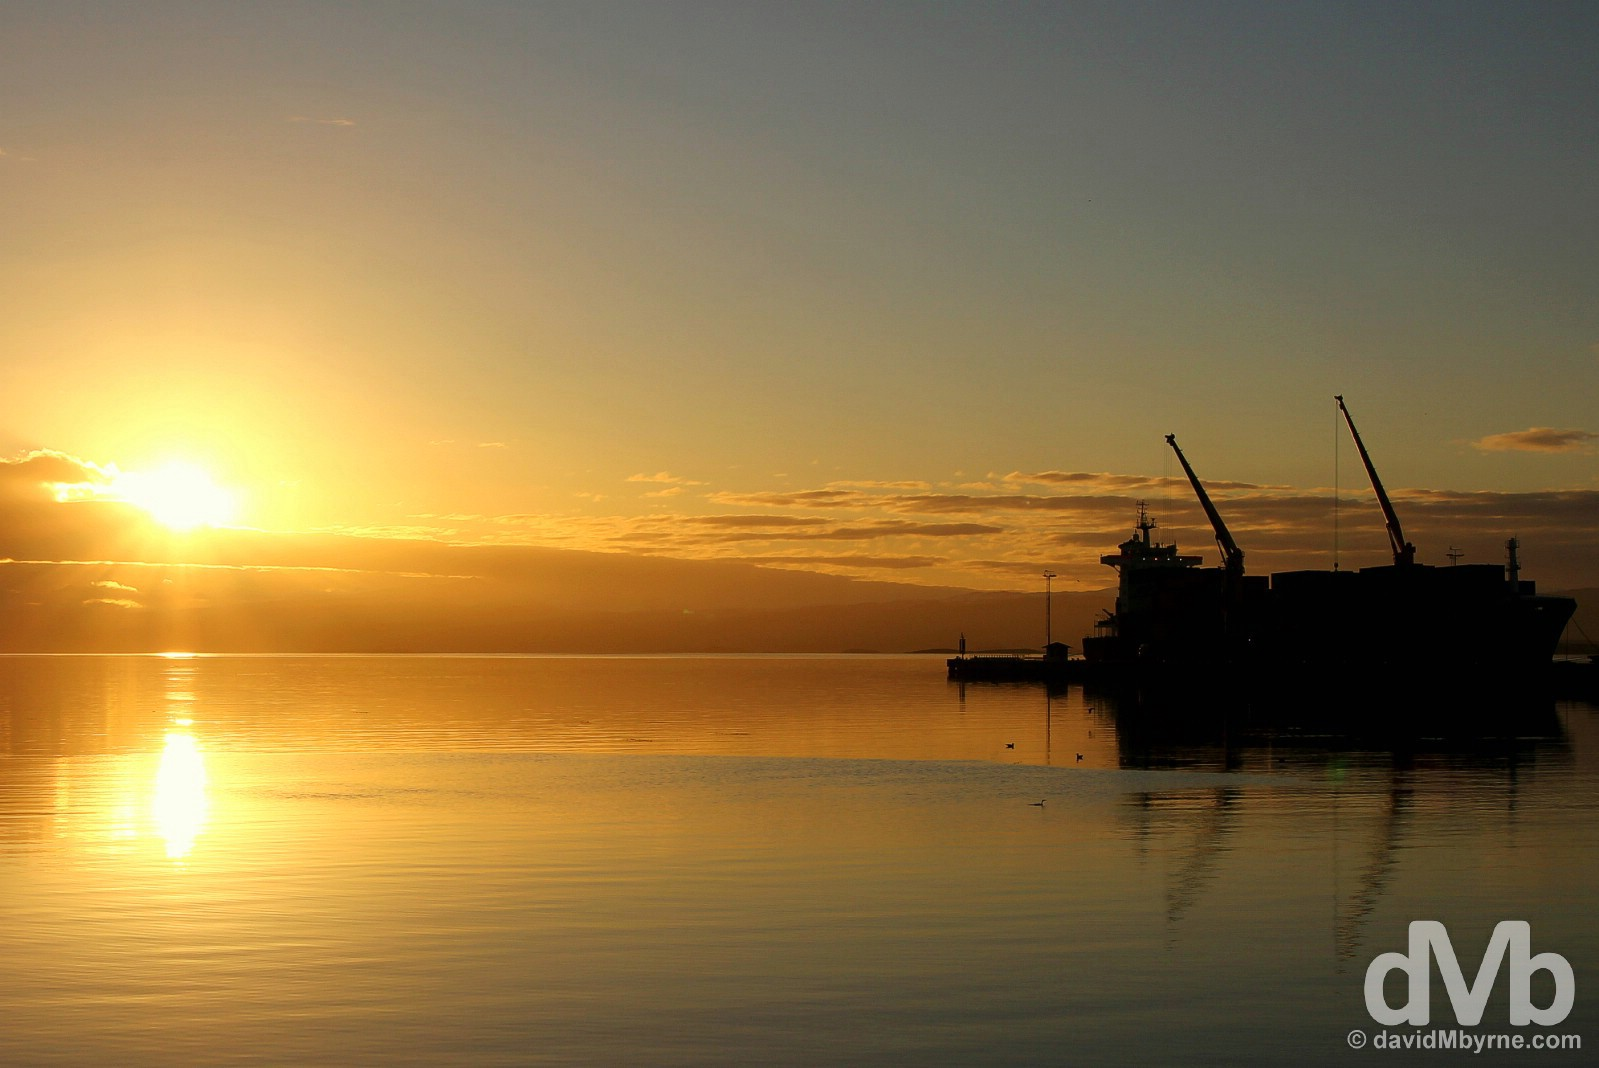 Sunrise in Ushuaia port, Tierra del Fuego, Argentina. November 19, 2015.